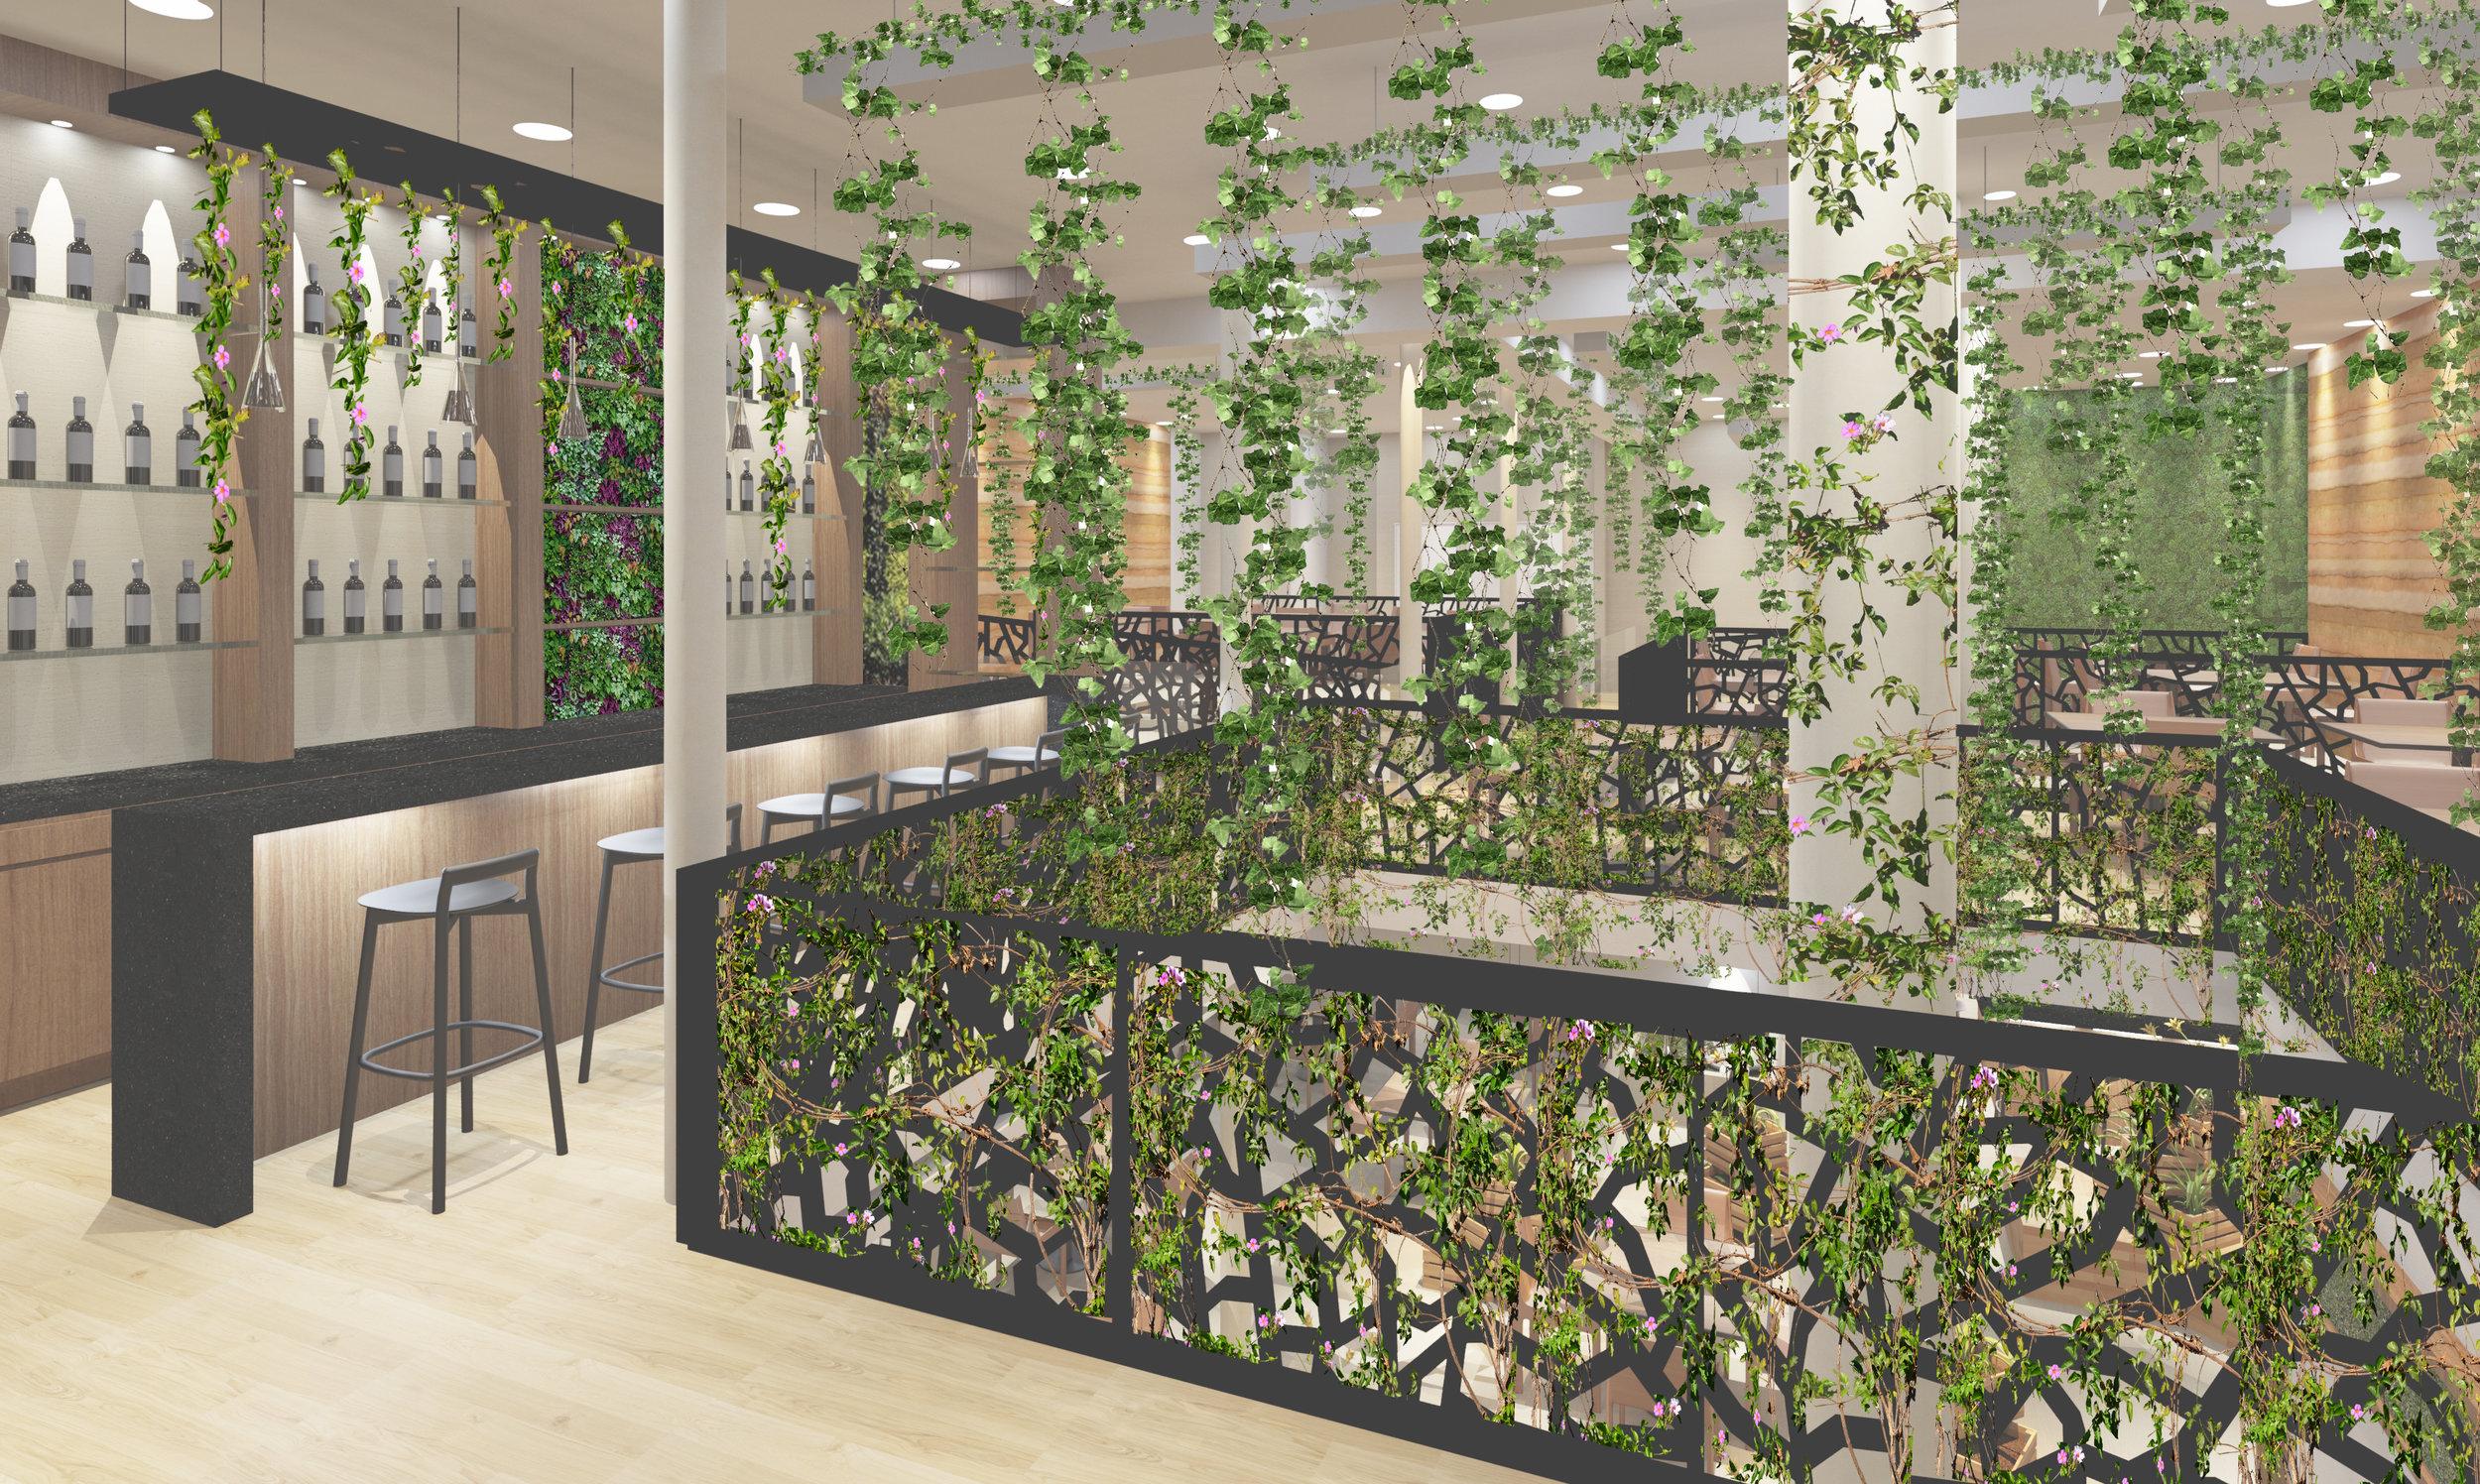 lamprini-alexandra-filotheidi--ana-beatriz-mayr-de-almeida-mps-s-the-garden-restaurant--tribeca-new-york_35158960241_o.jpg